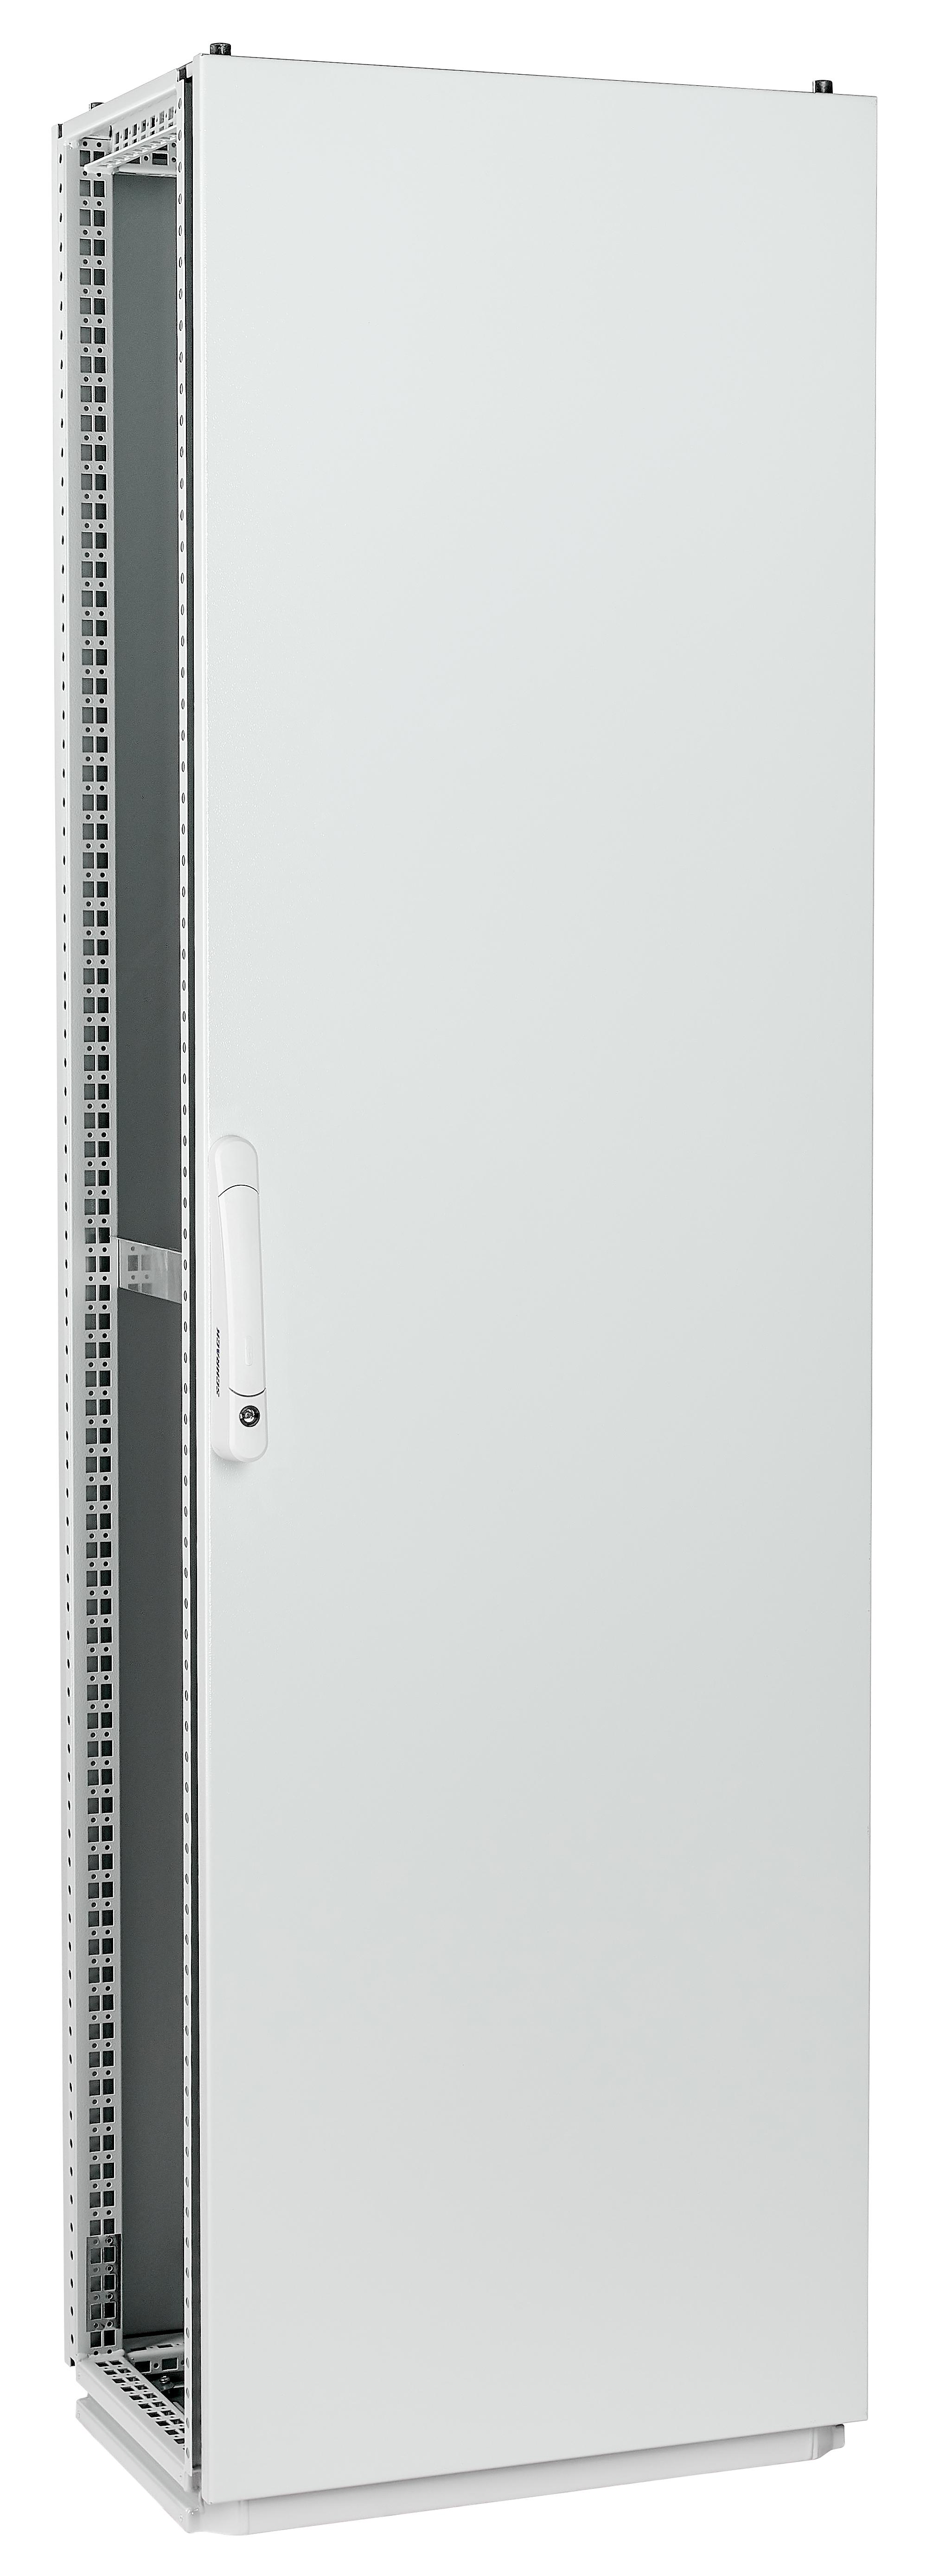 1 Stk Anreihschrank 1-Tür IP55 H=2000 B=600 T=400mm Stahlblech AC206041--